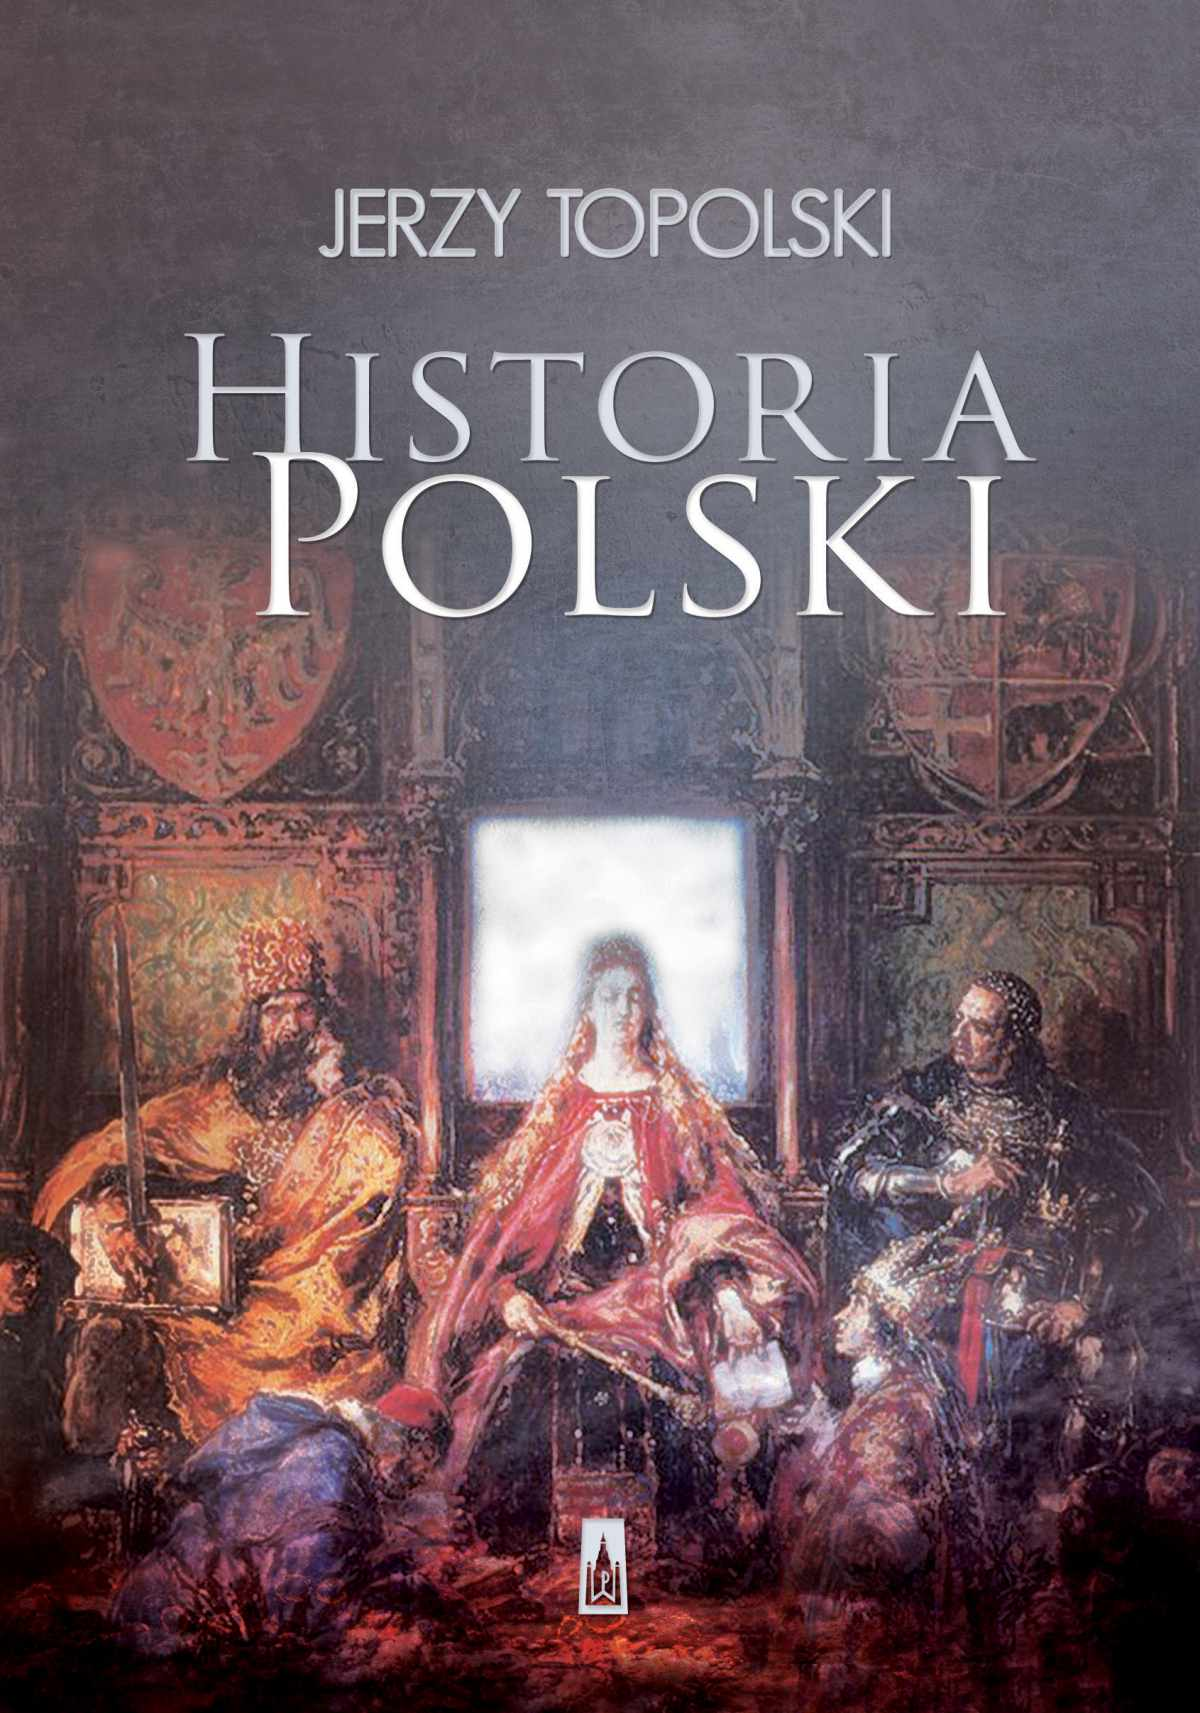 Historia Polski - Ebook (Książka na Kindle) do pobrania w formacie MOBI